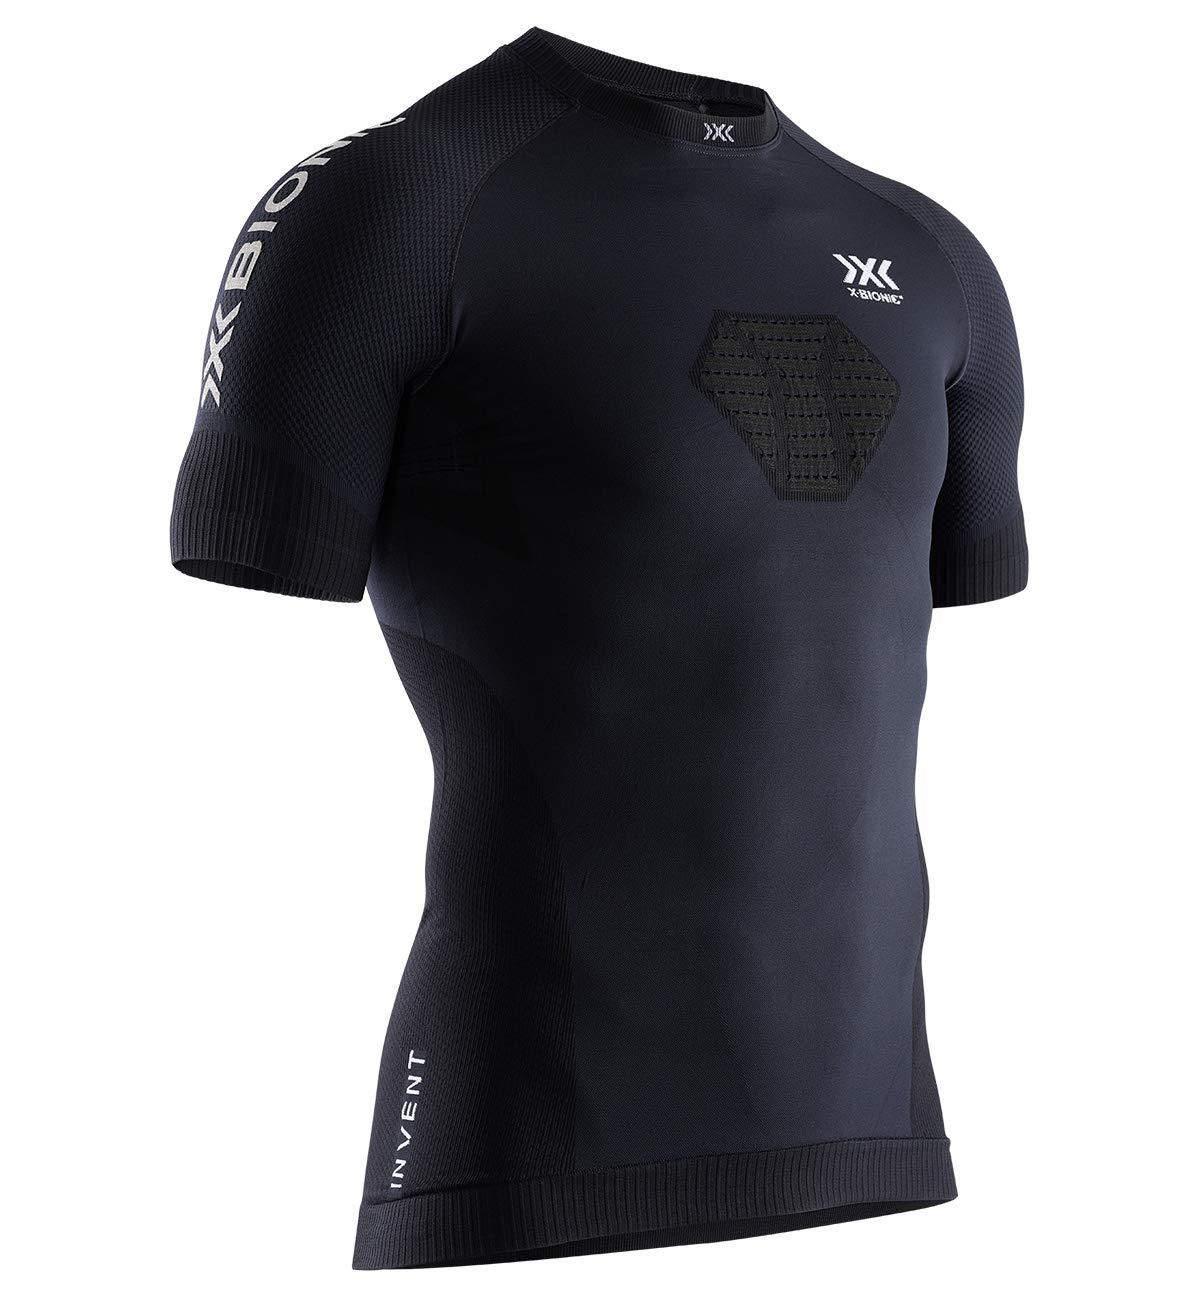 X-Bionic Herren Invent Run Speed, Short Sleeve Shirt, Opal Black/Arctic White, X